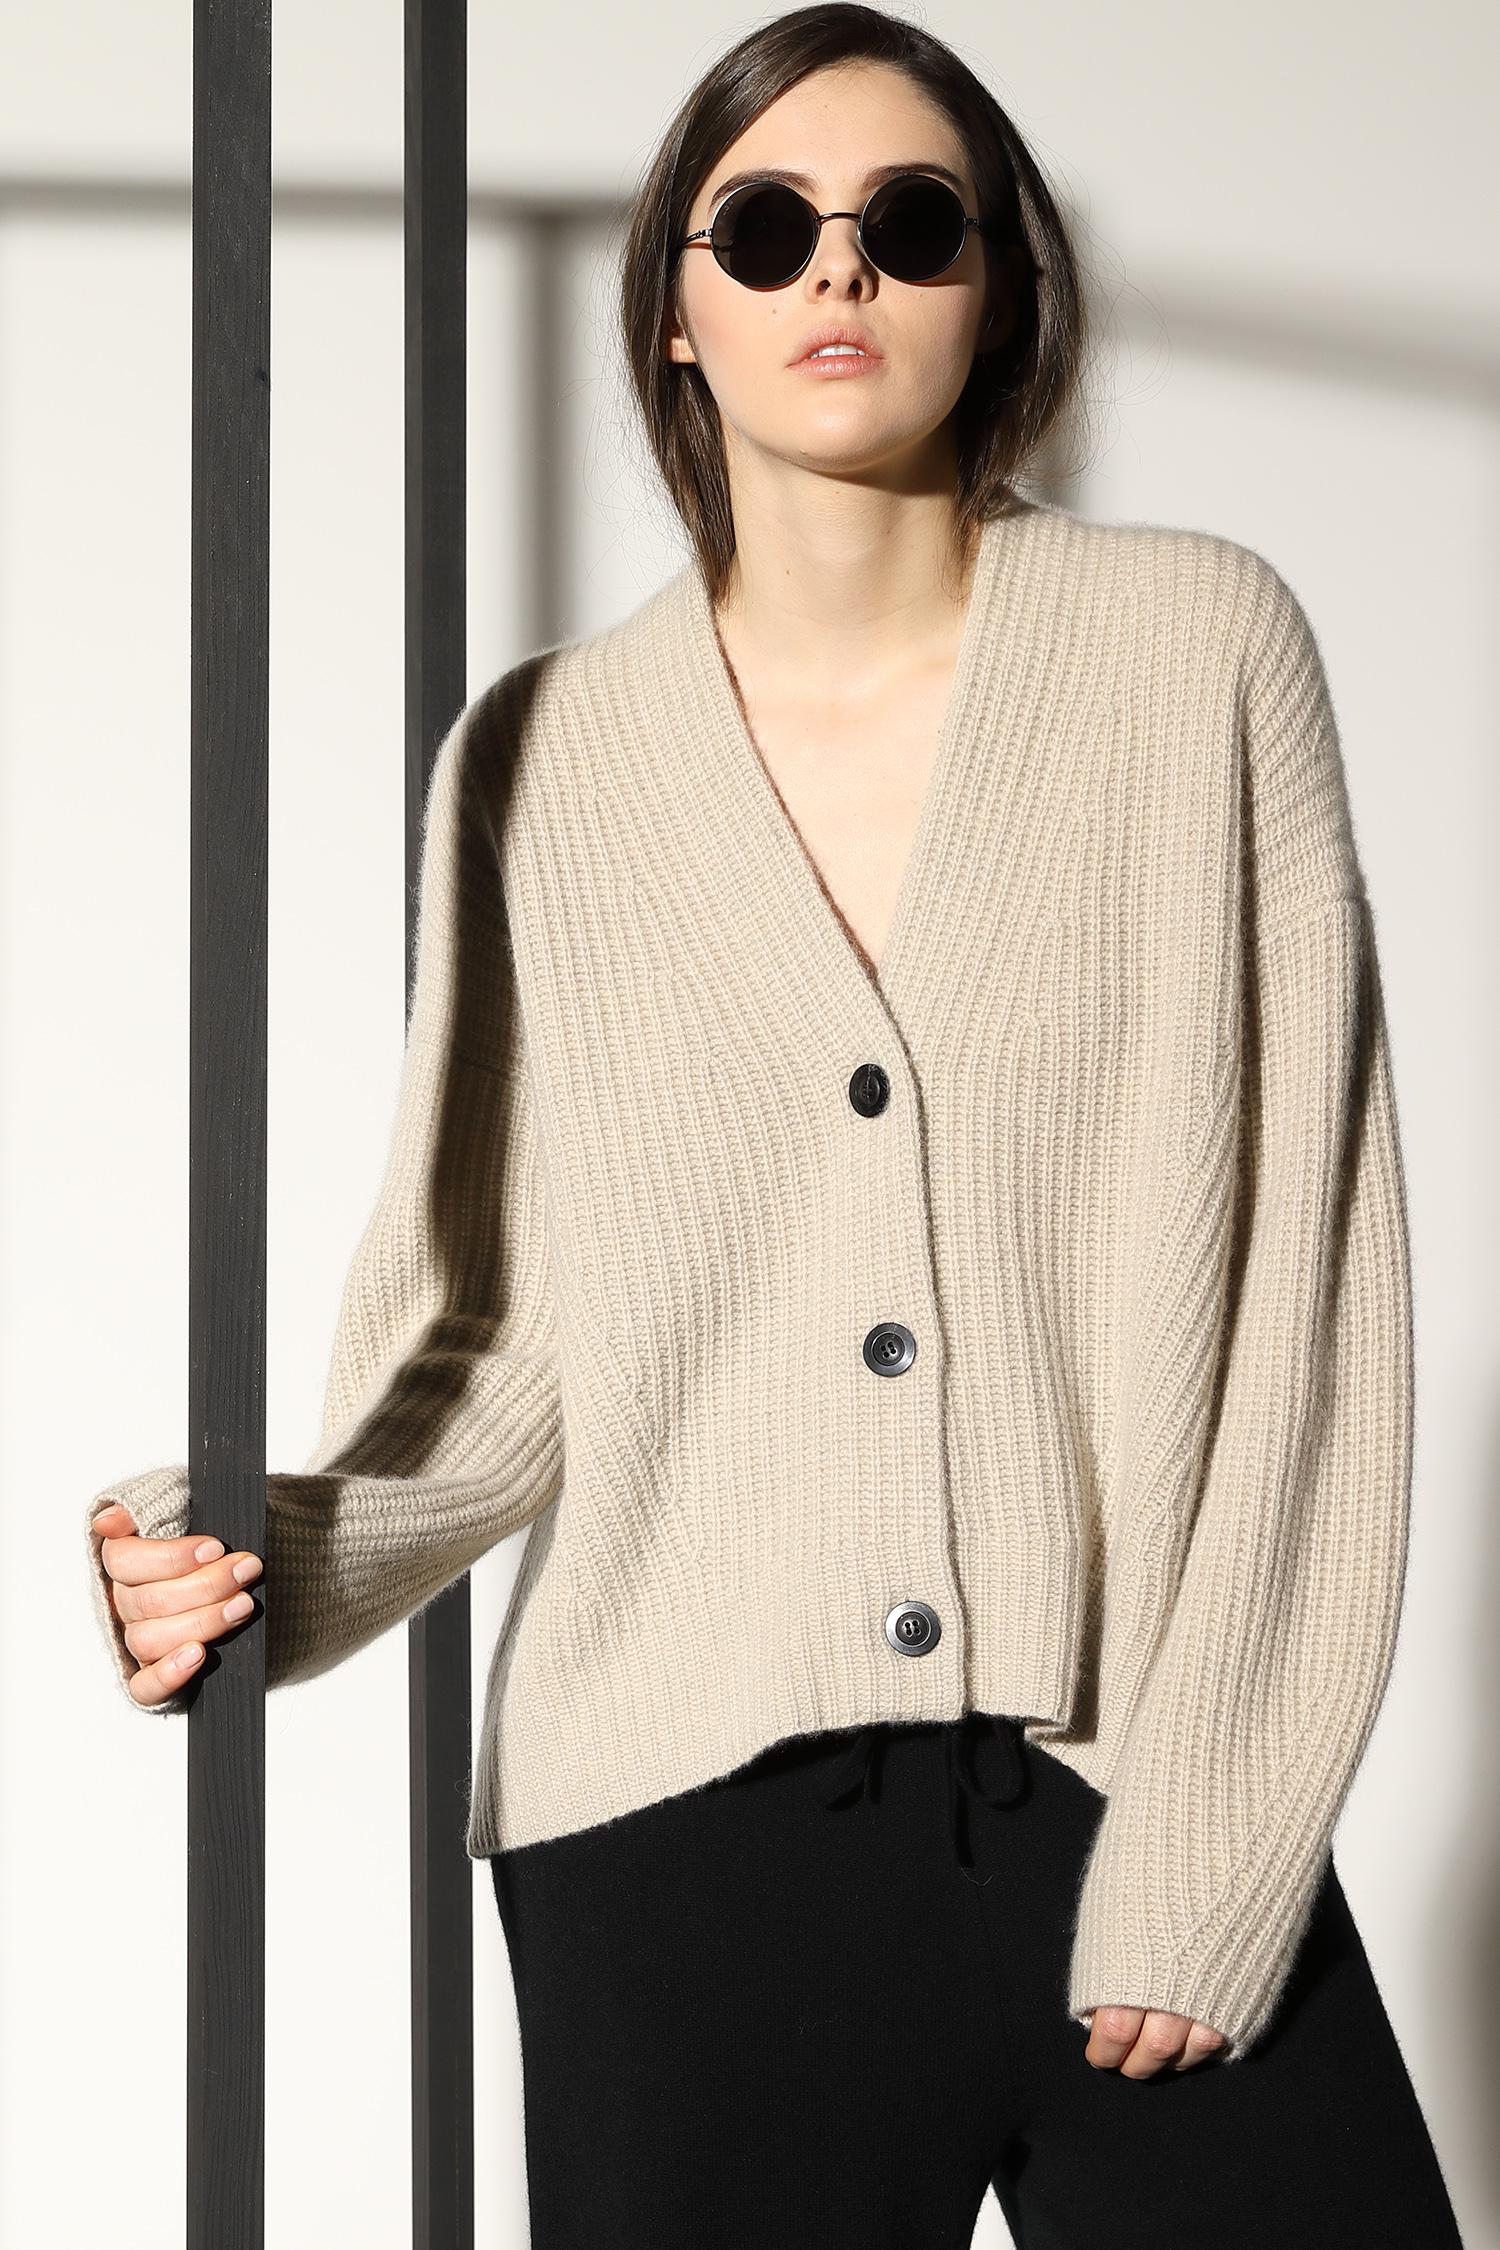 SMINFINITY Knitwear Hamburg Germany, Foto: Holger Stoehrmann, mail@stoehrmann.com, 0177-6302754